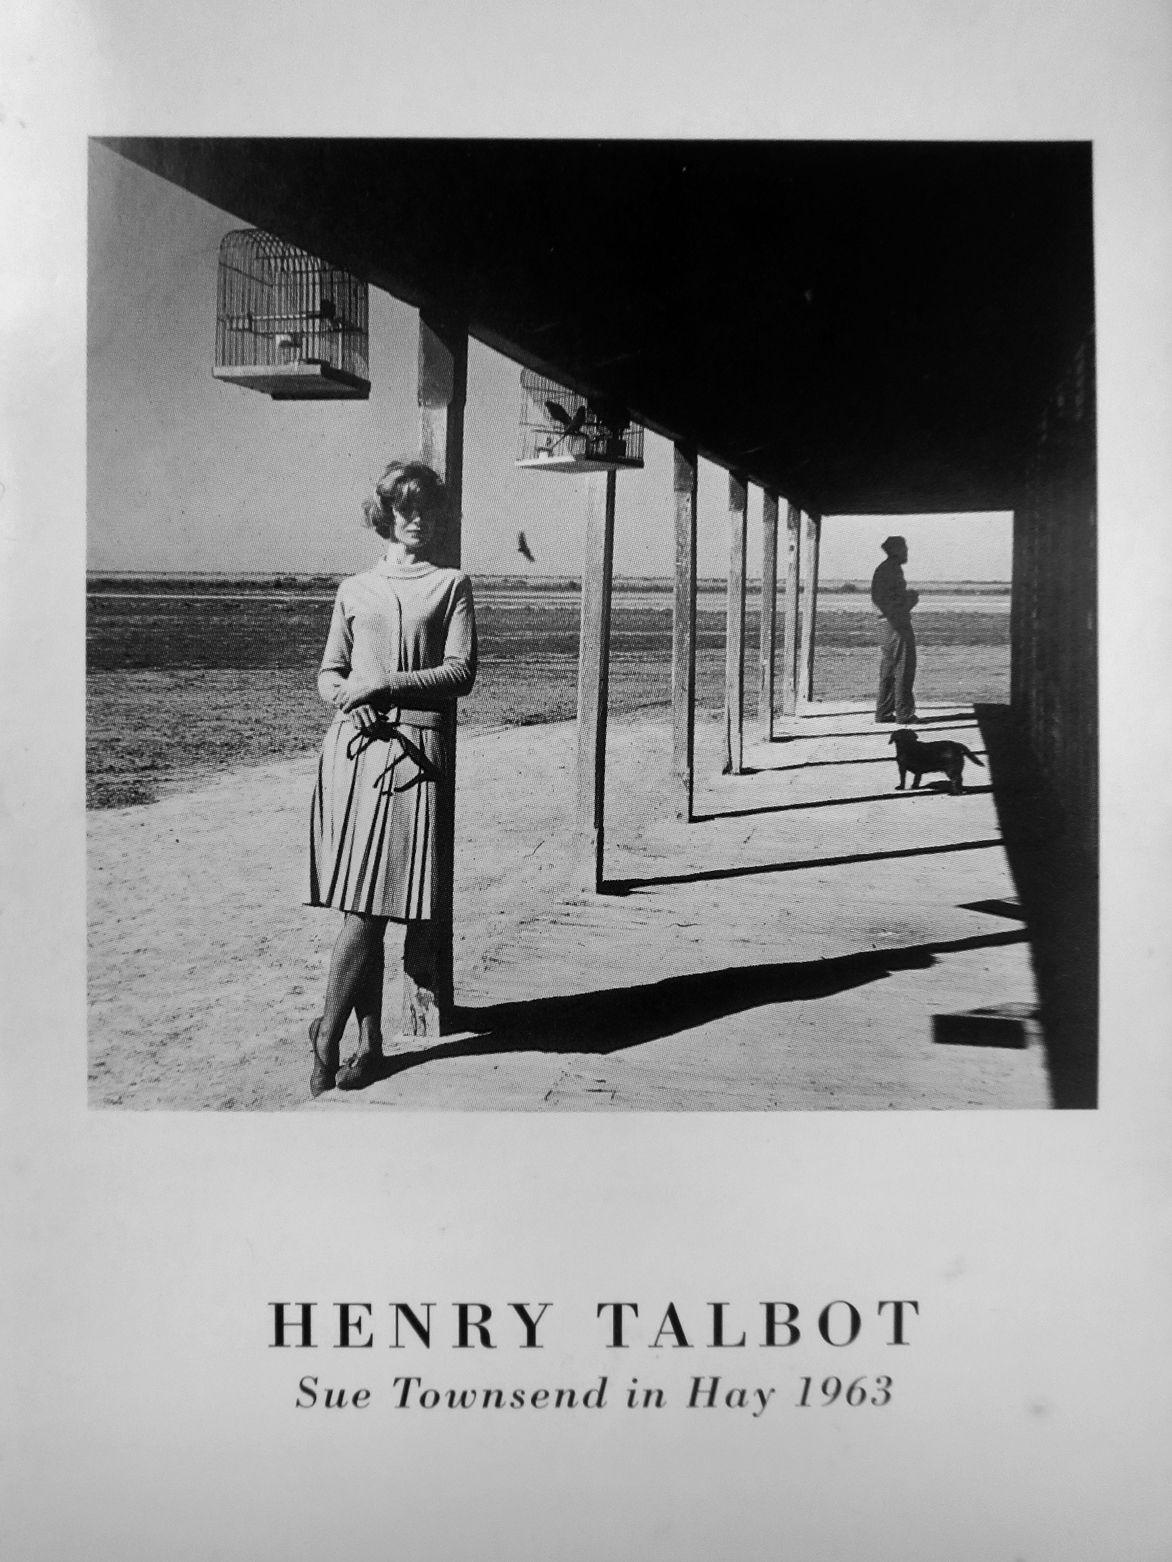 Henry Talbot Photography Retrospective Exhibition programme, Byron Mapp Gallery, 1998.